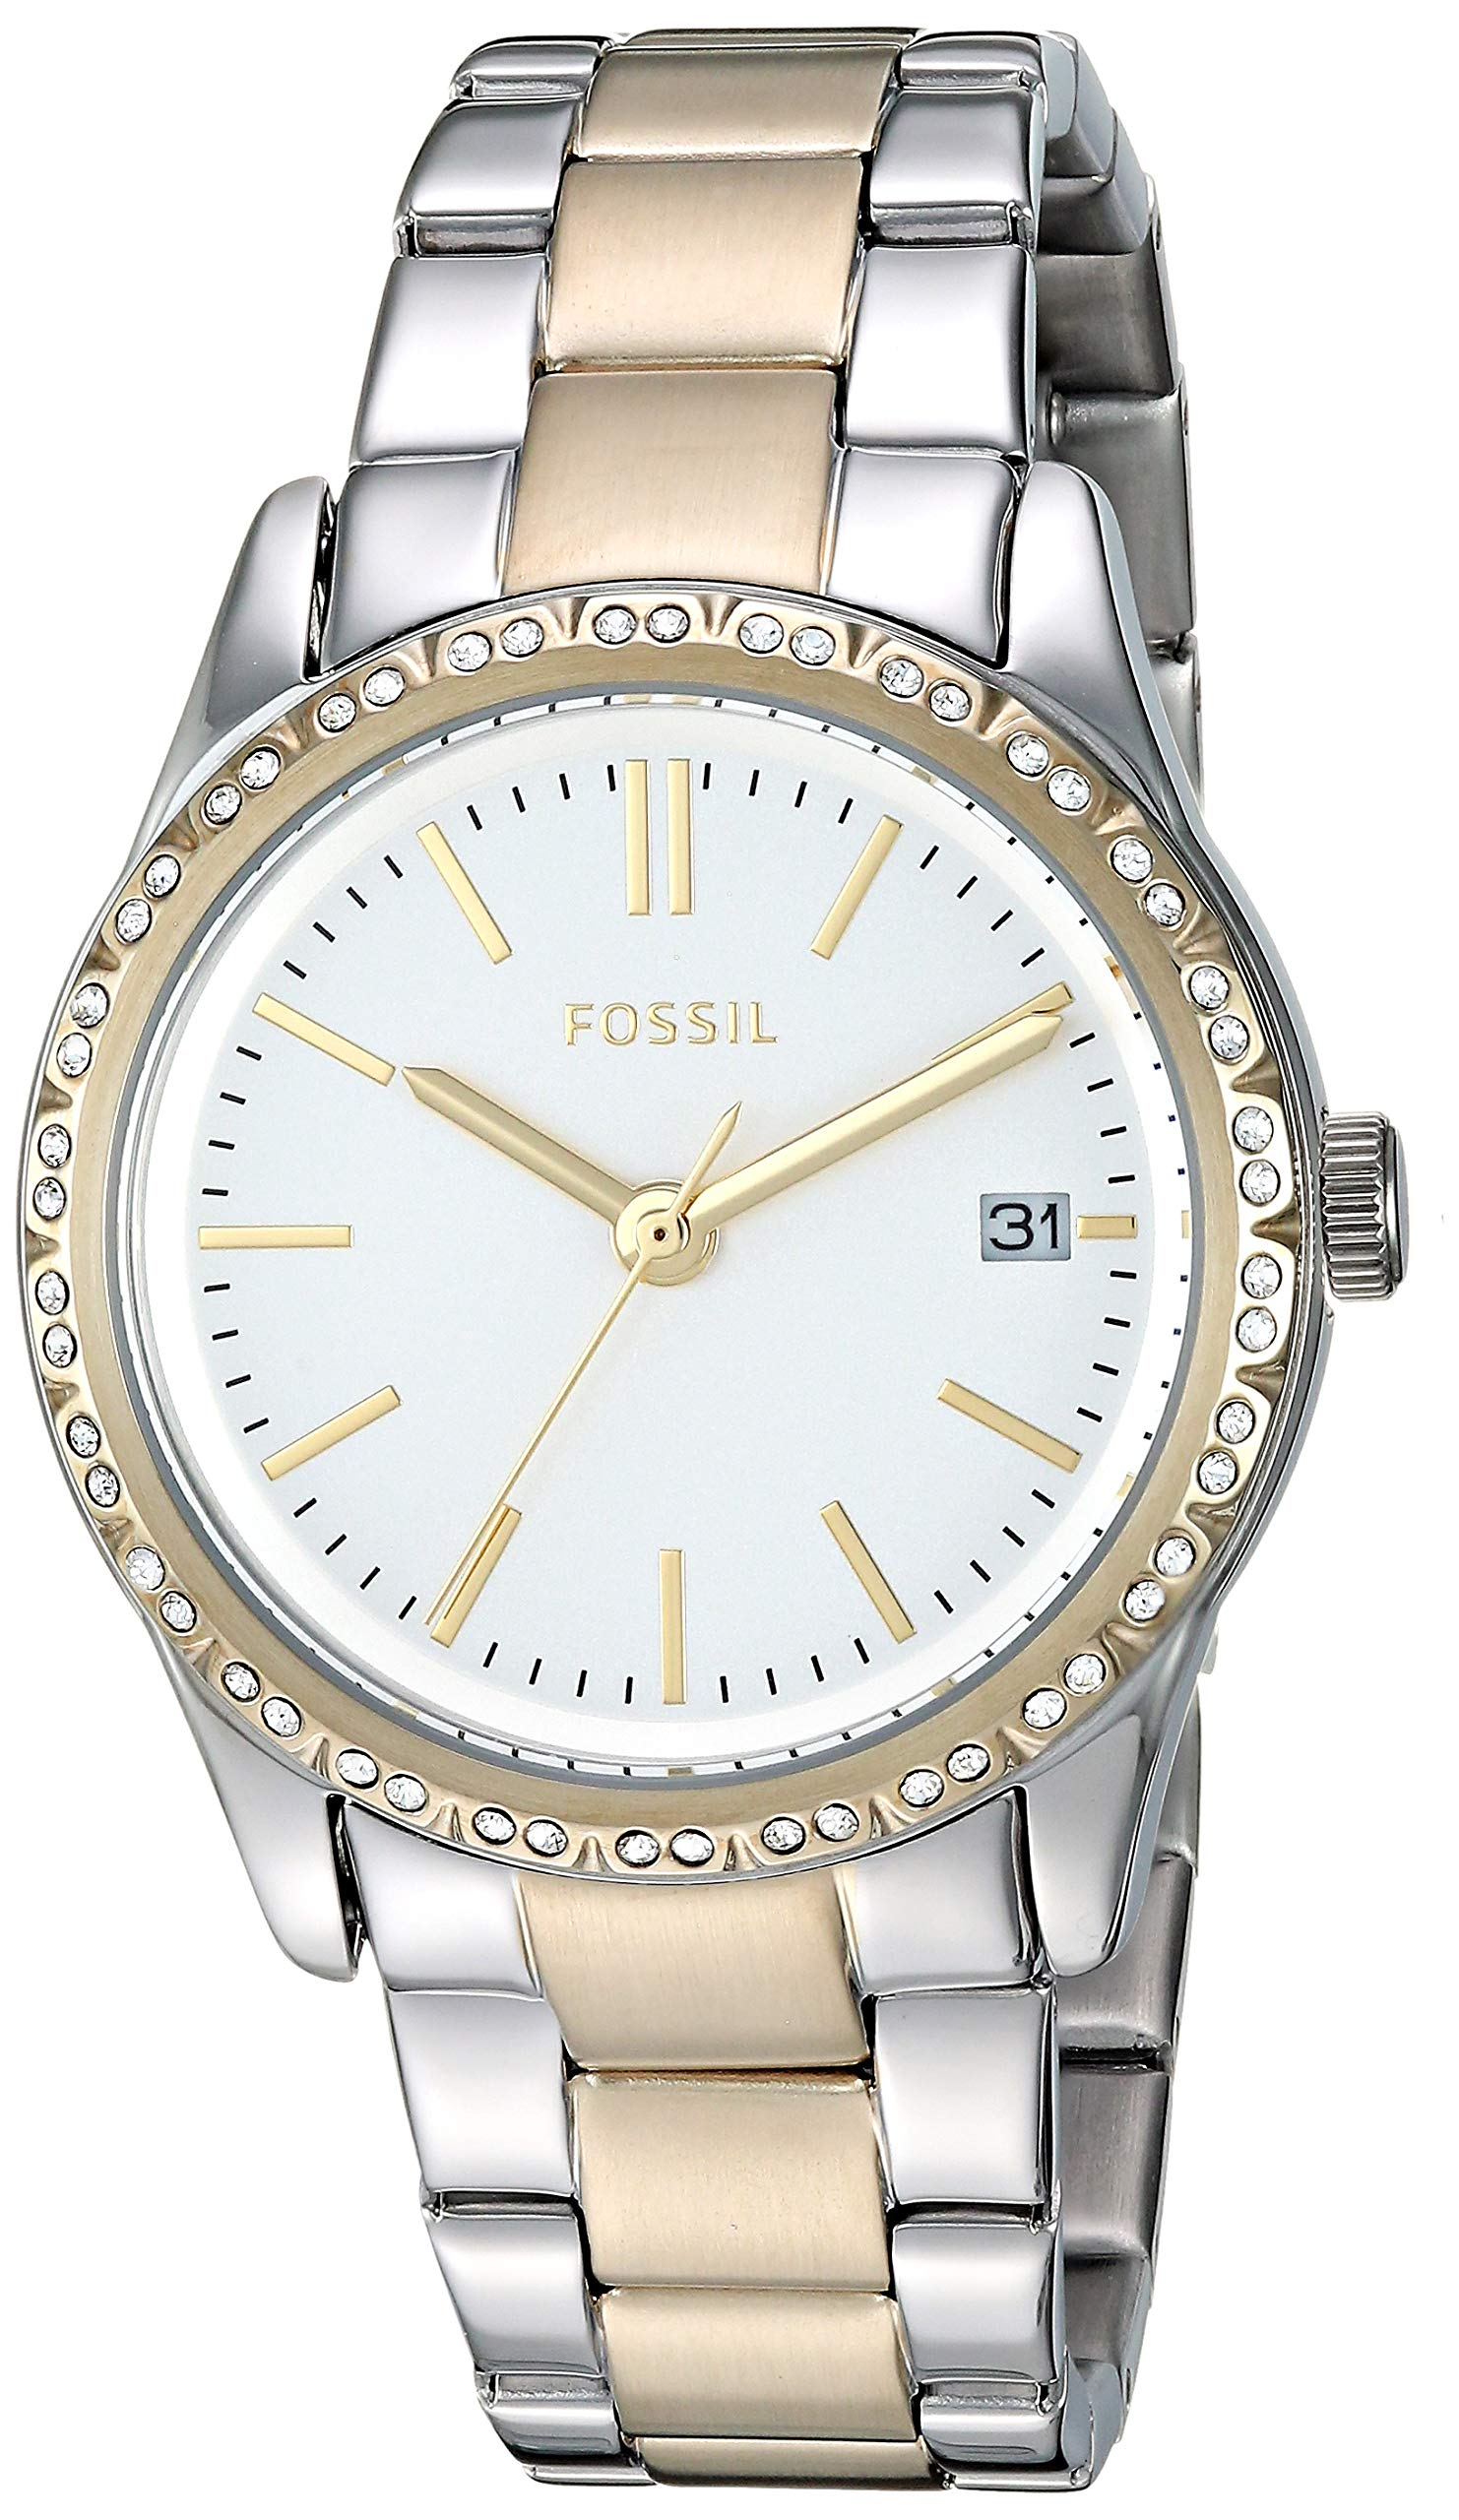 Fossil Dress Watch (Model: BQ3376)